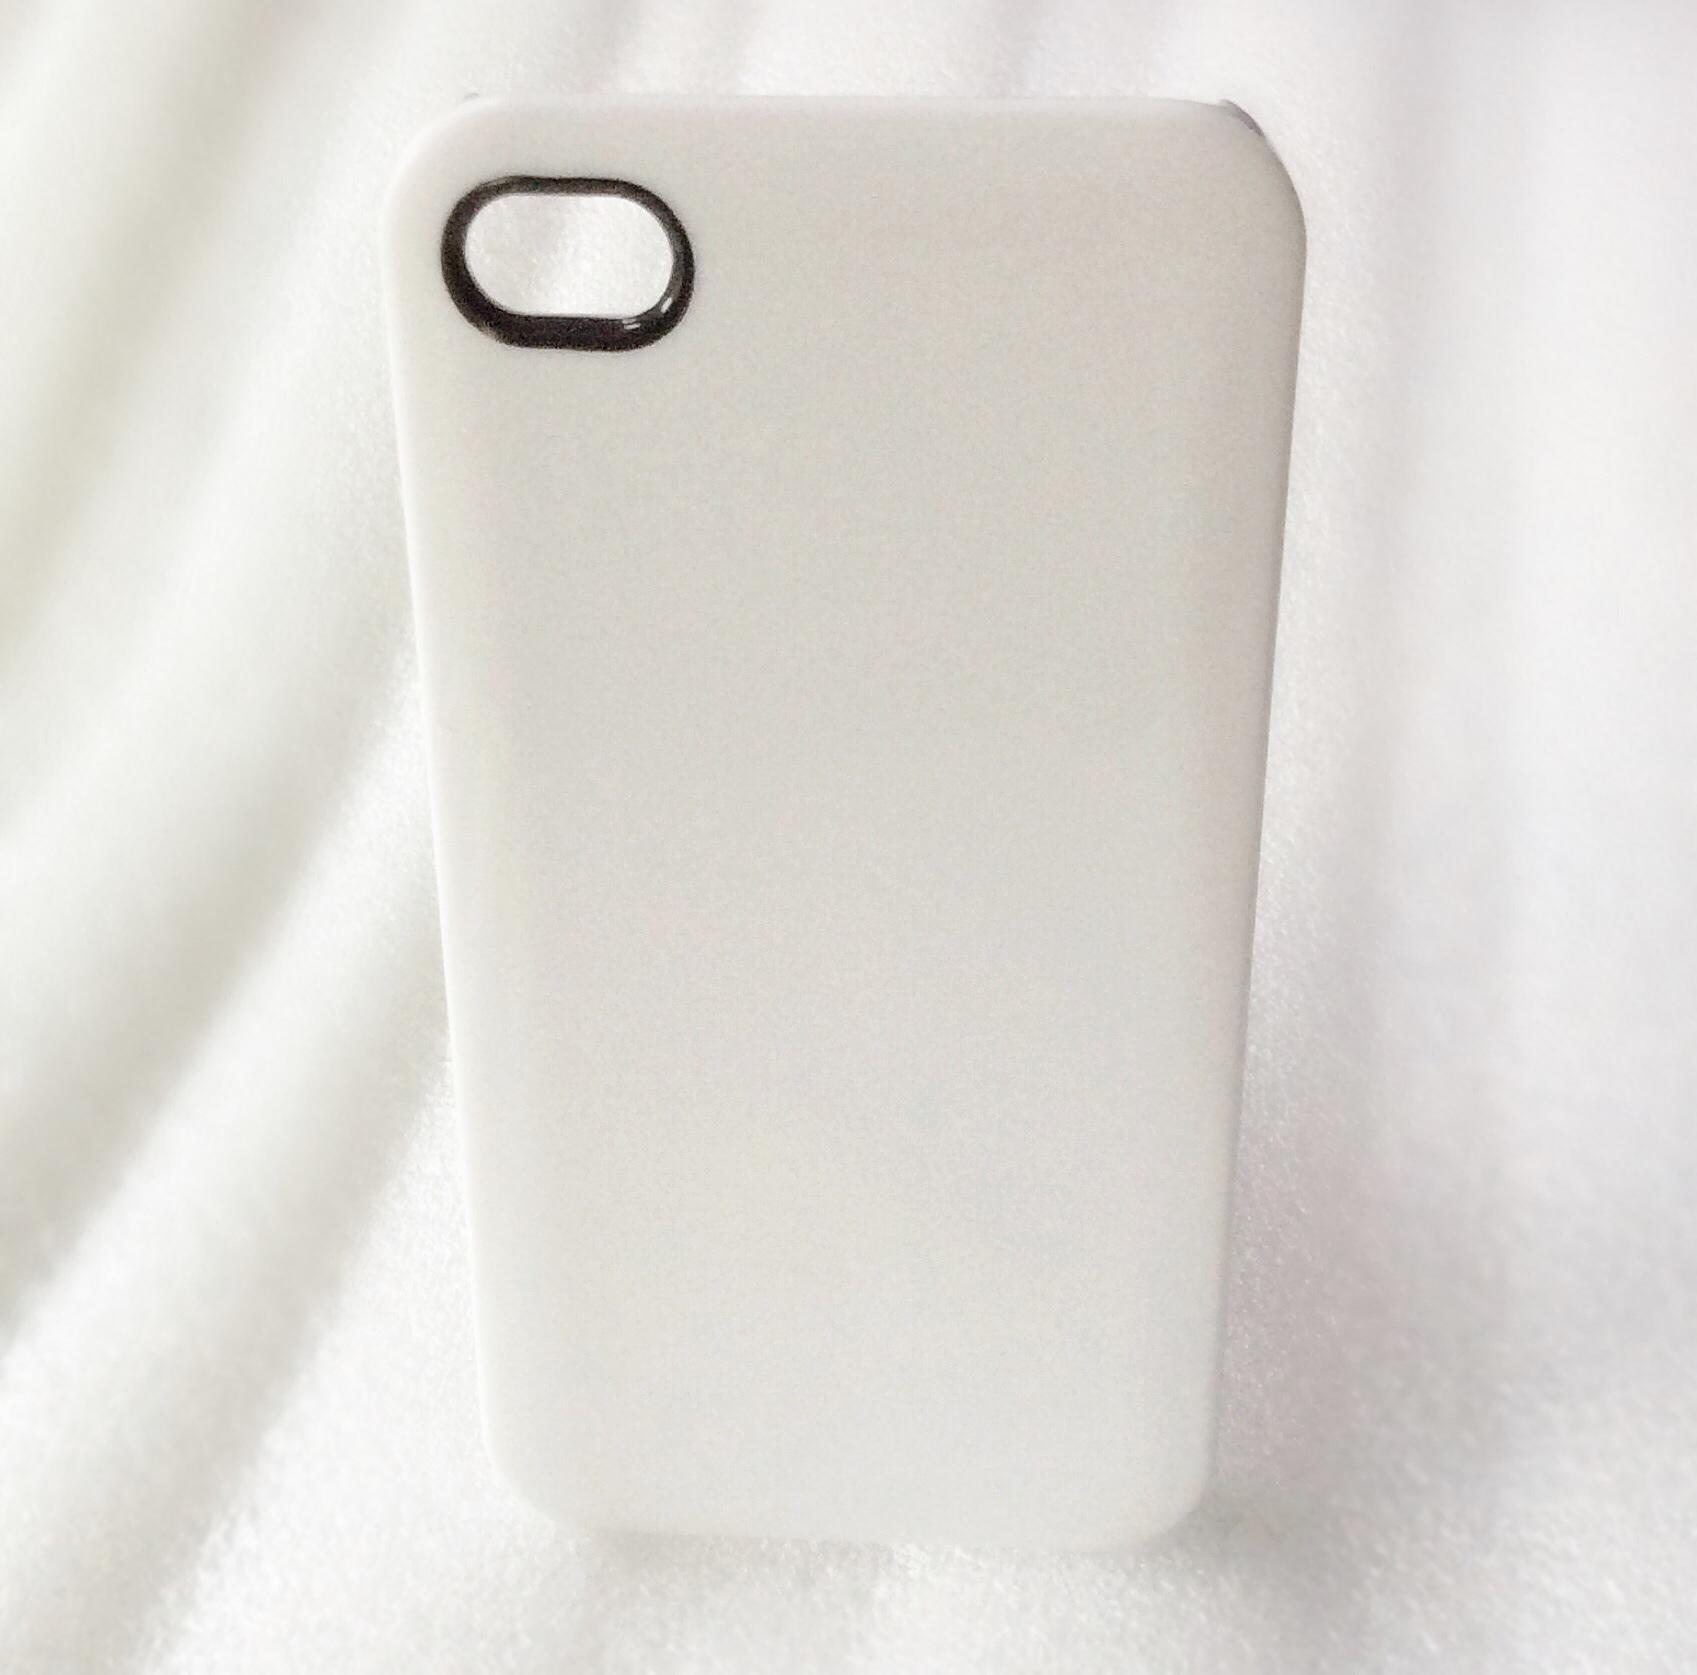 *Clearance Sale* Case iPhone 4/4s สีขาว